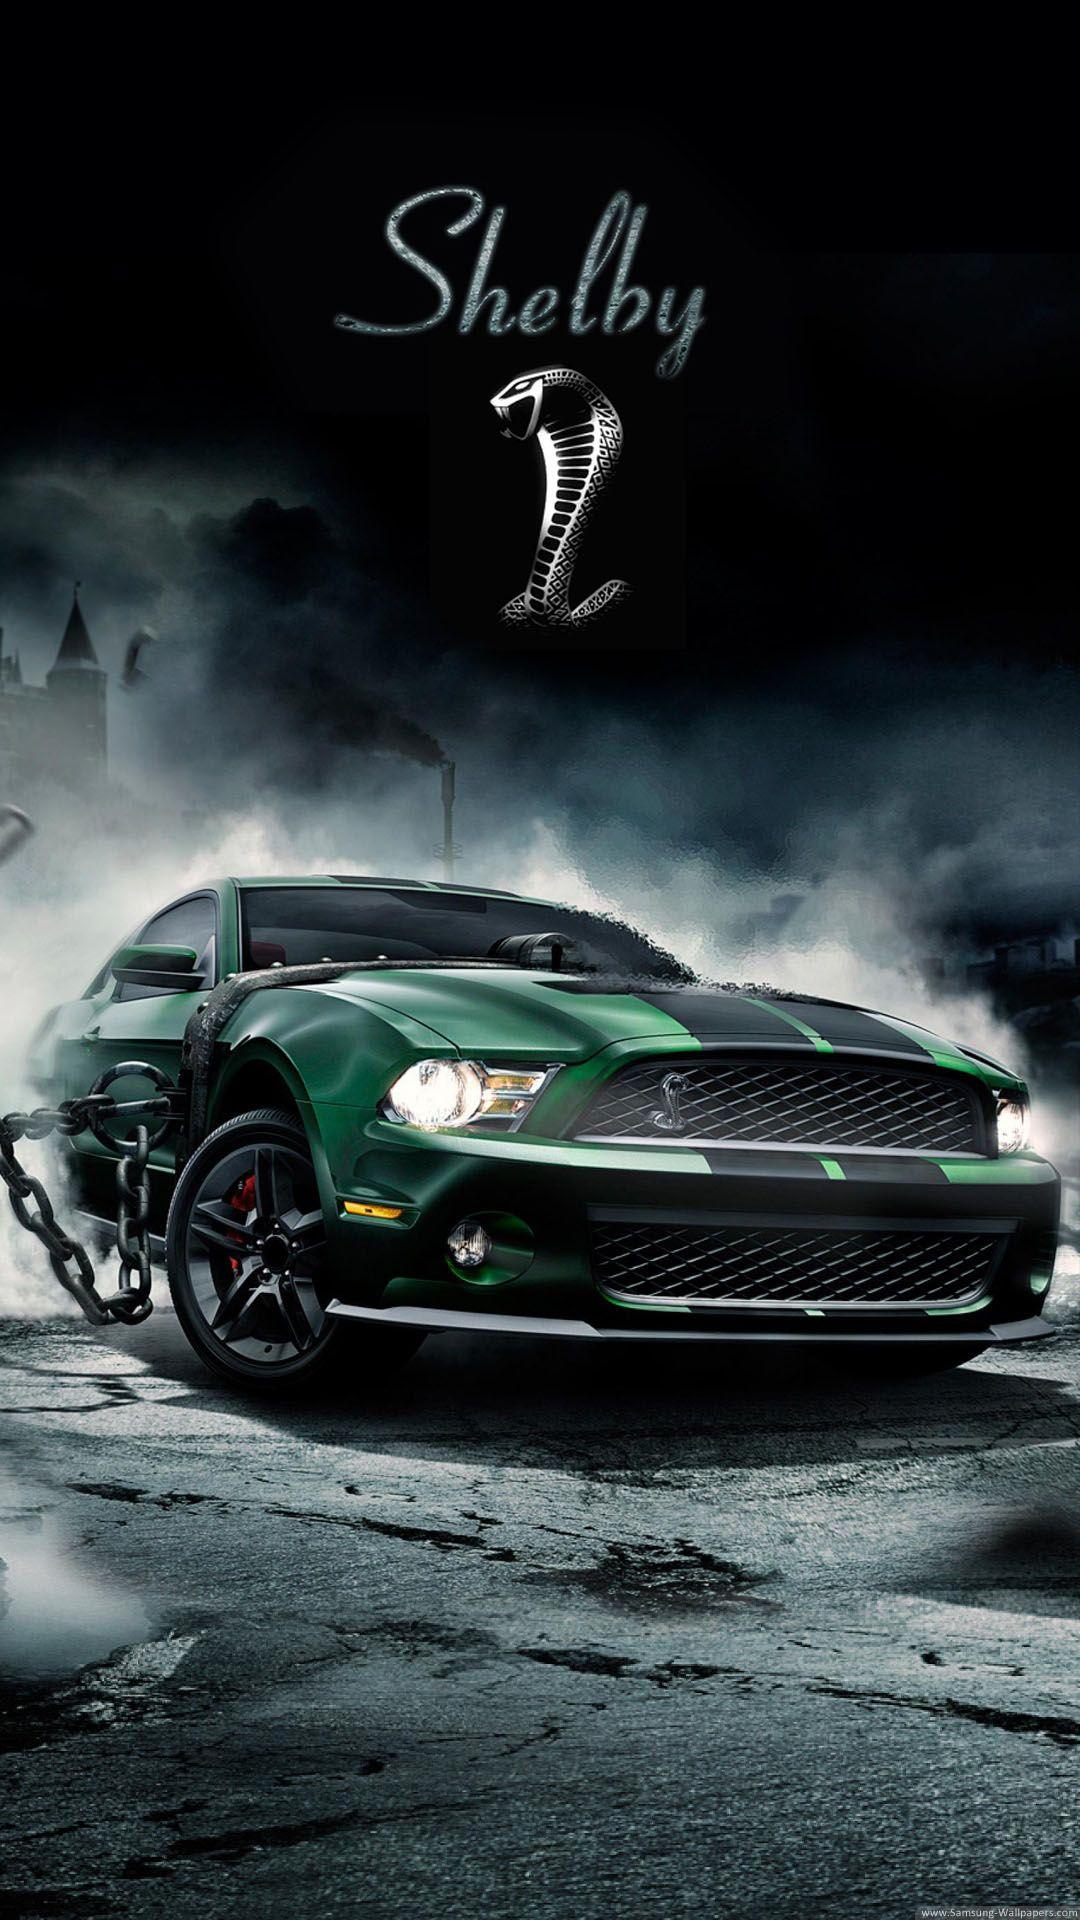 Shelby Cobra Muscle Car Car Iphone Wallpaper Mustang Wallpaper